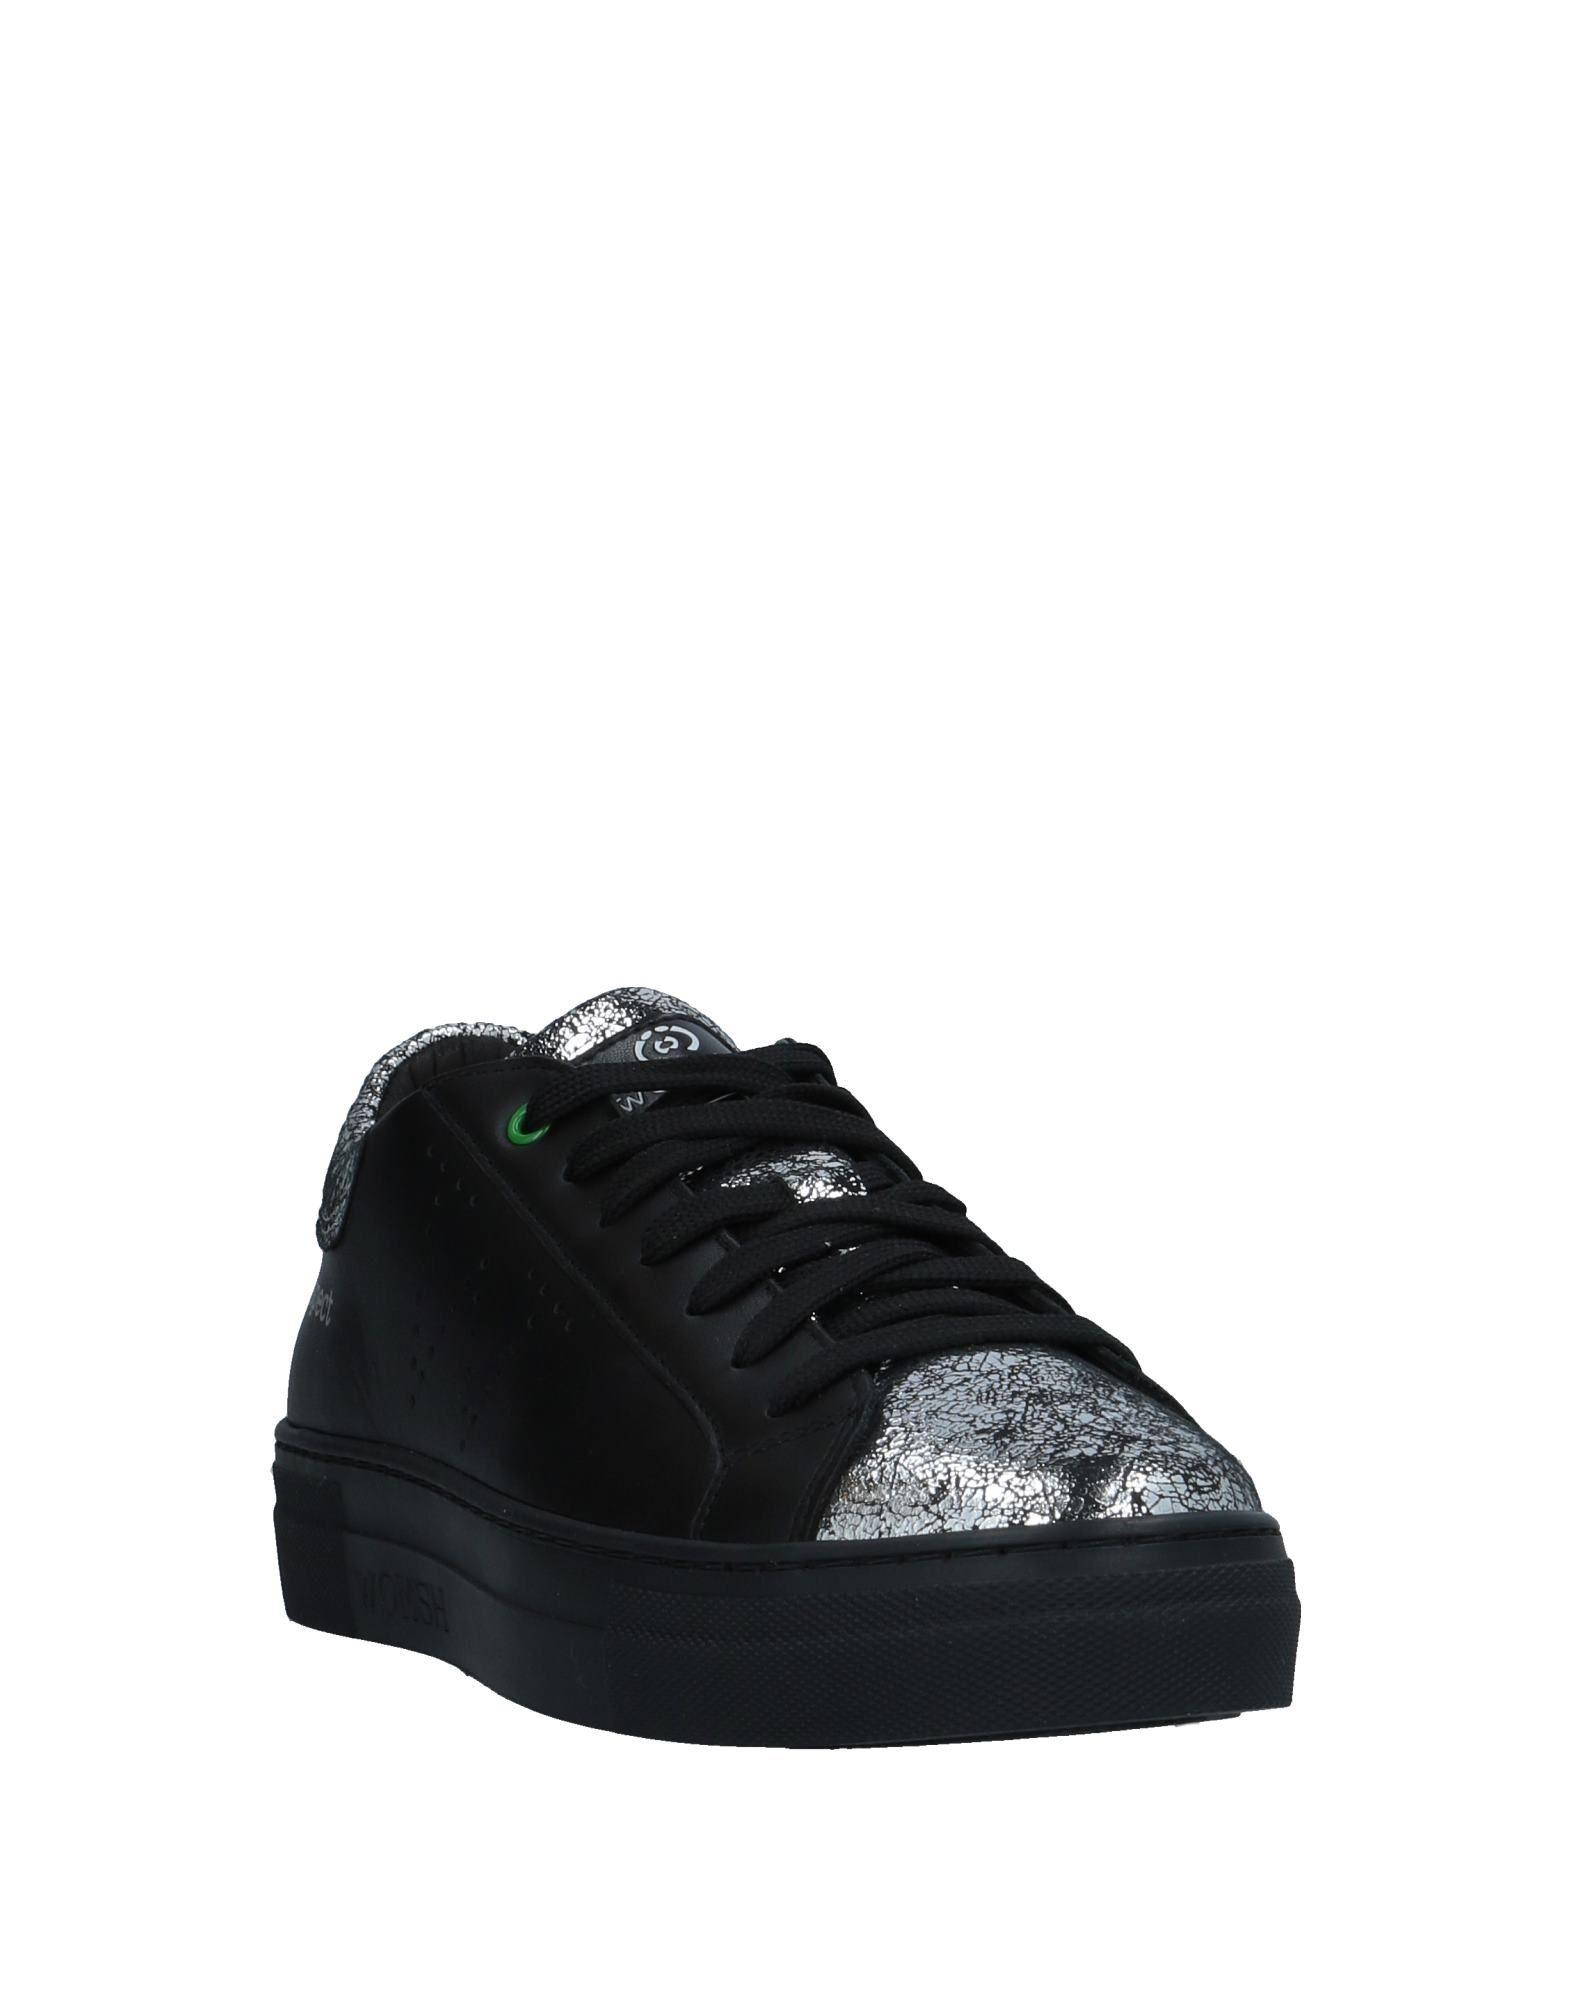 Womsh 11508683UO Sneakers Damen  11508683UO Womsh Gute Qualität beliebte Schuhe cb056f